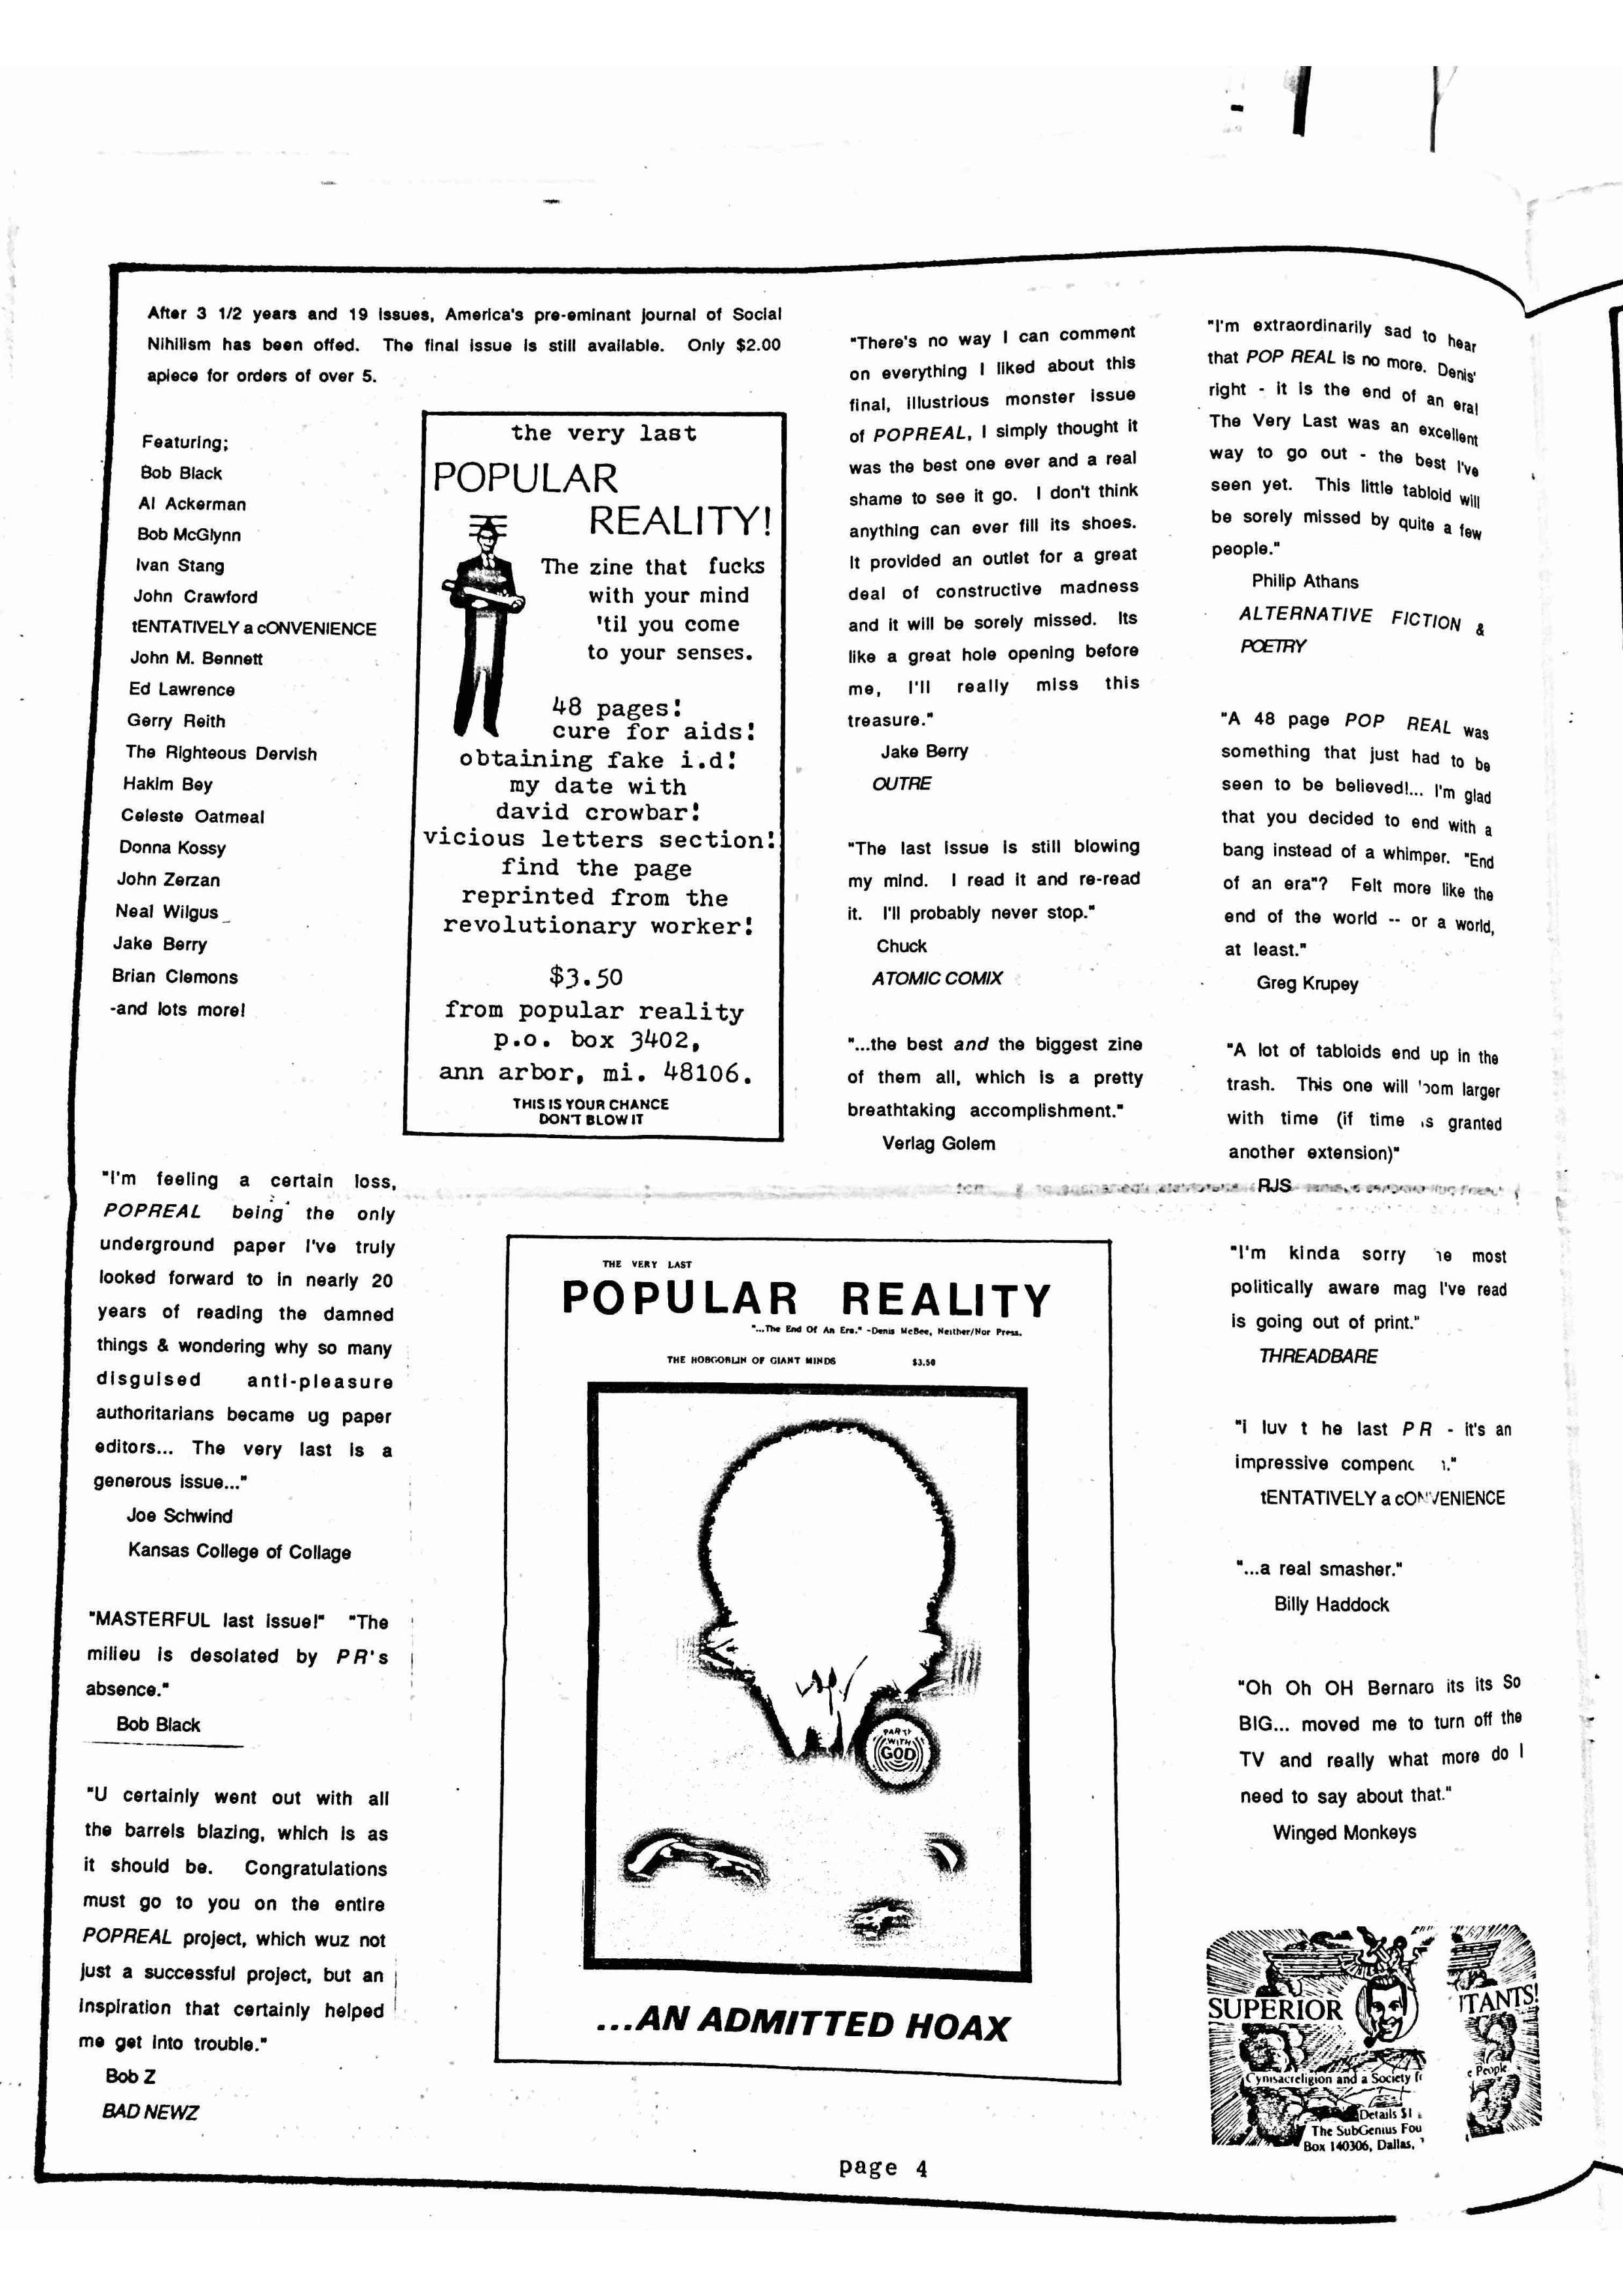 PopRealAdven-page-004.jpg